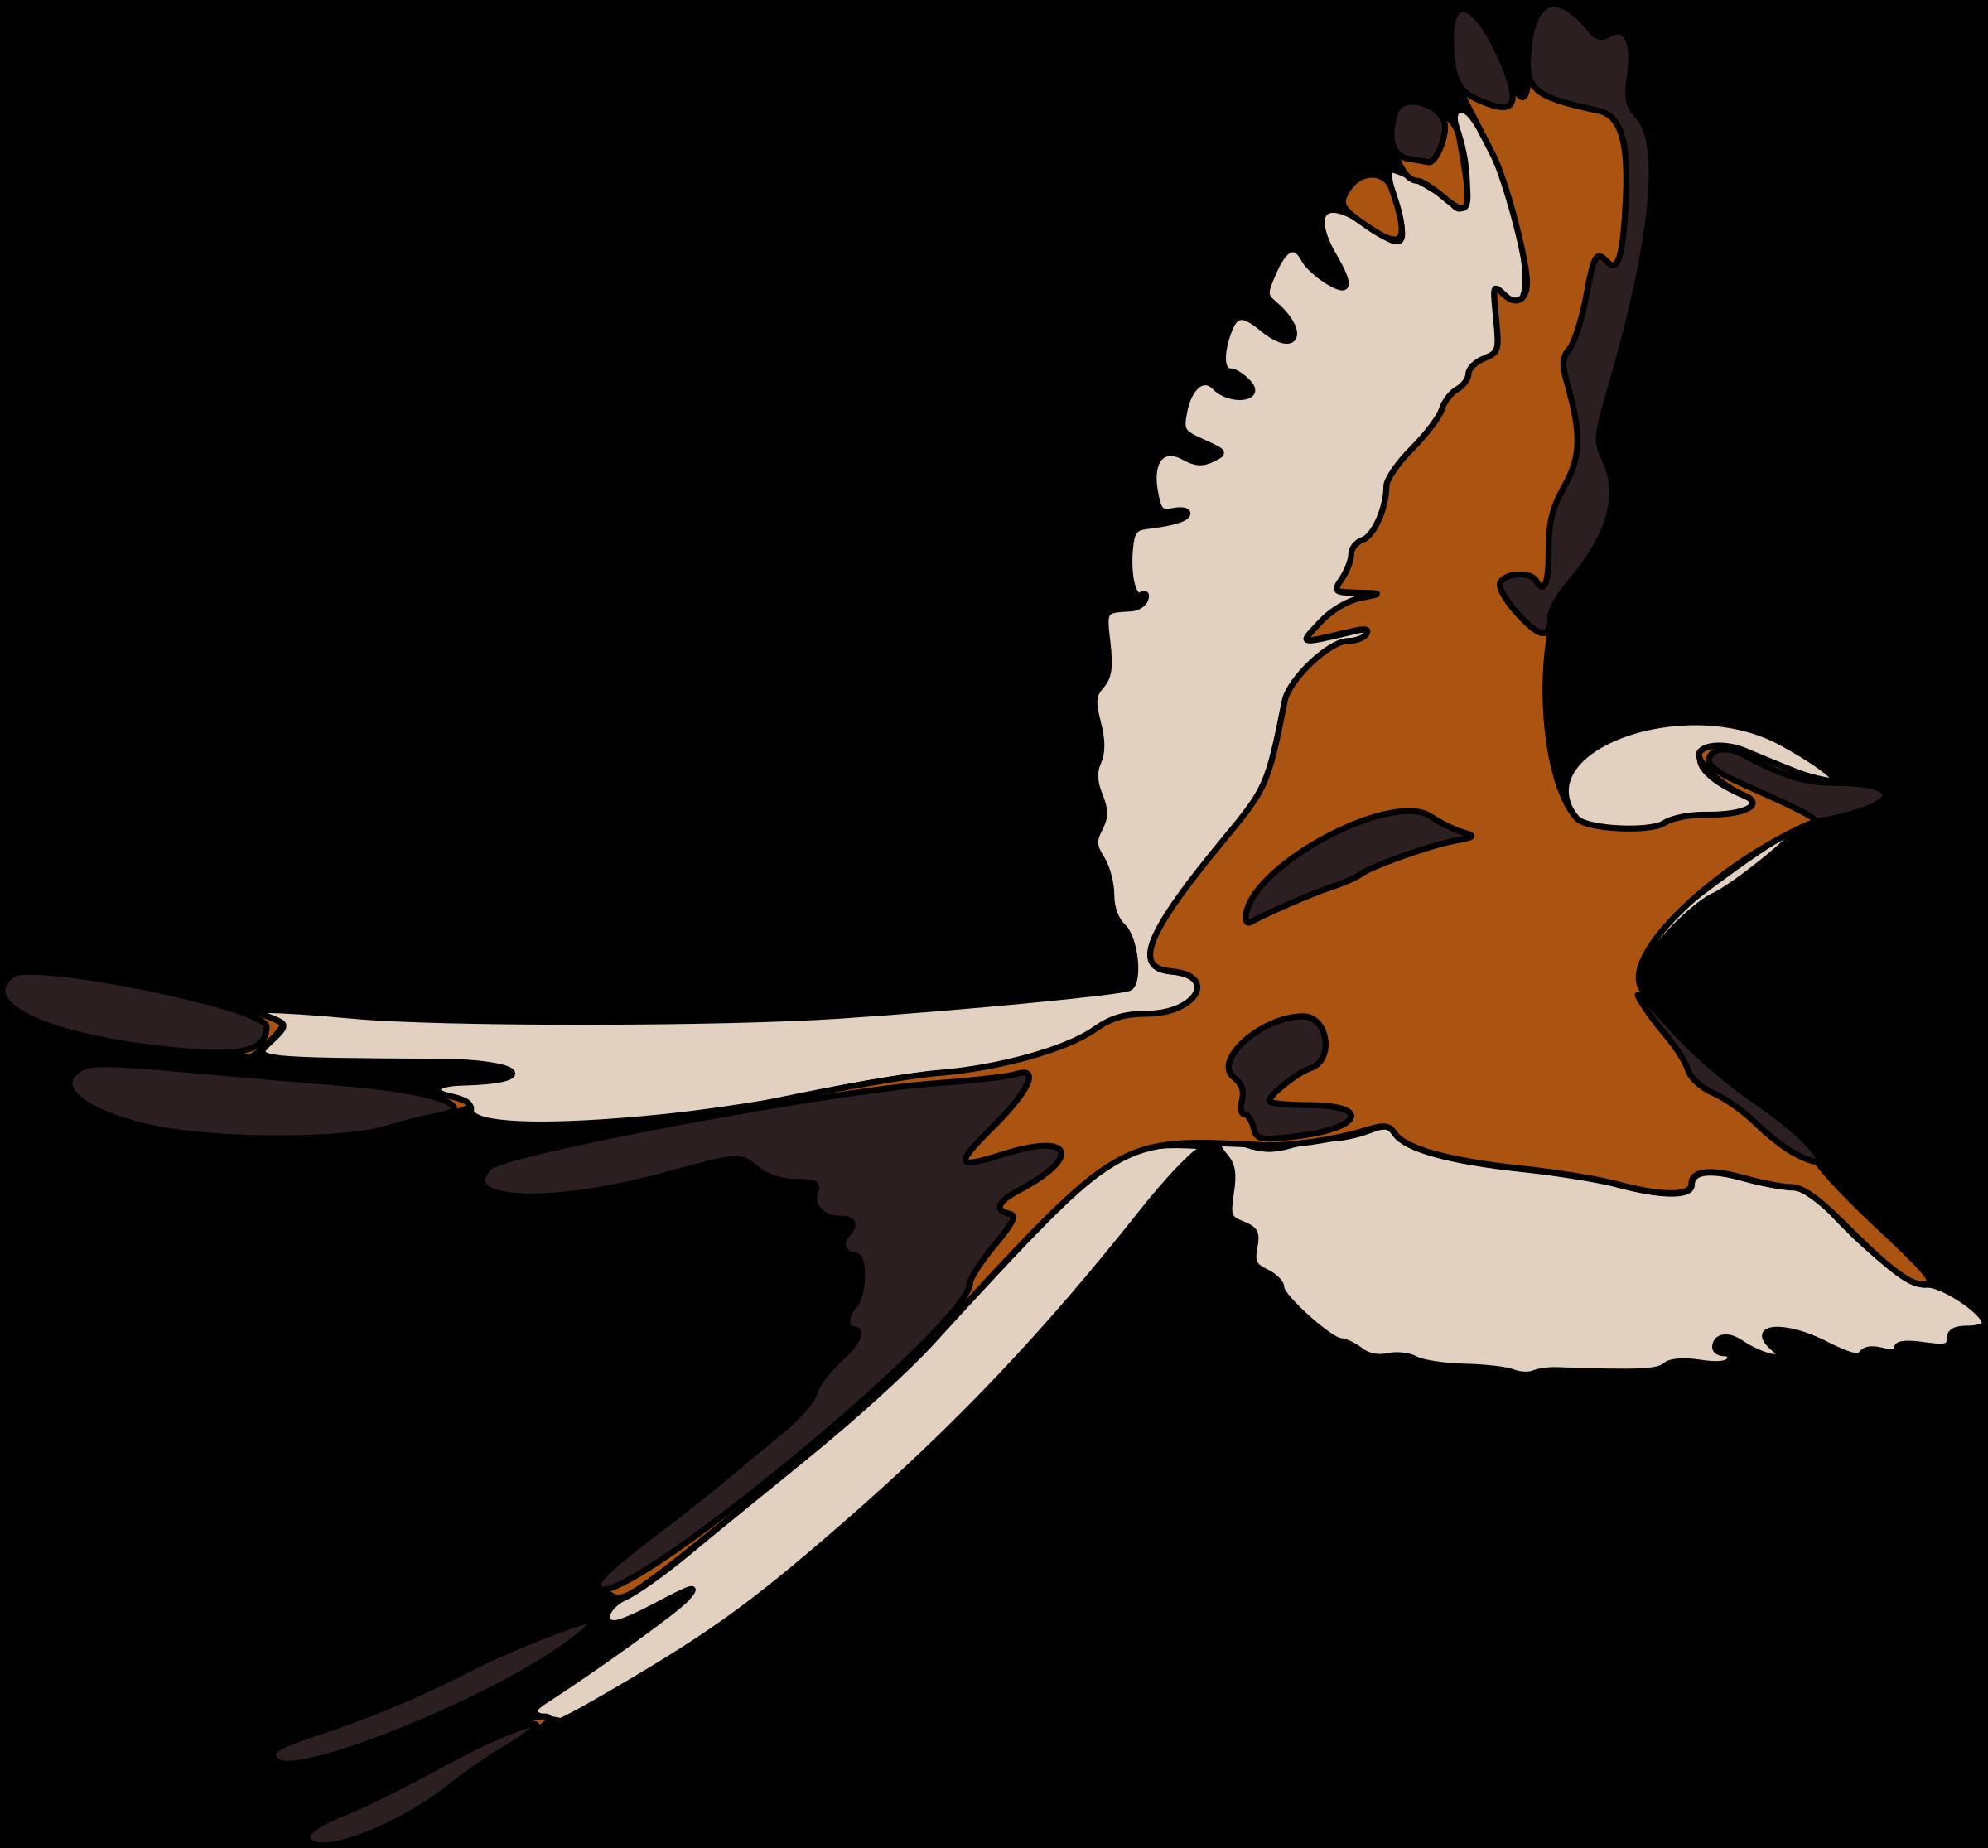 Sea Bird Clipart Maya Pencil And In Color - Maya Bird Clipart (2400x2231)